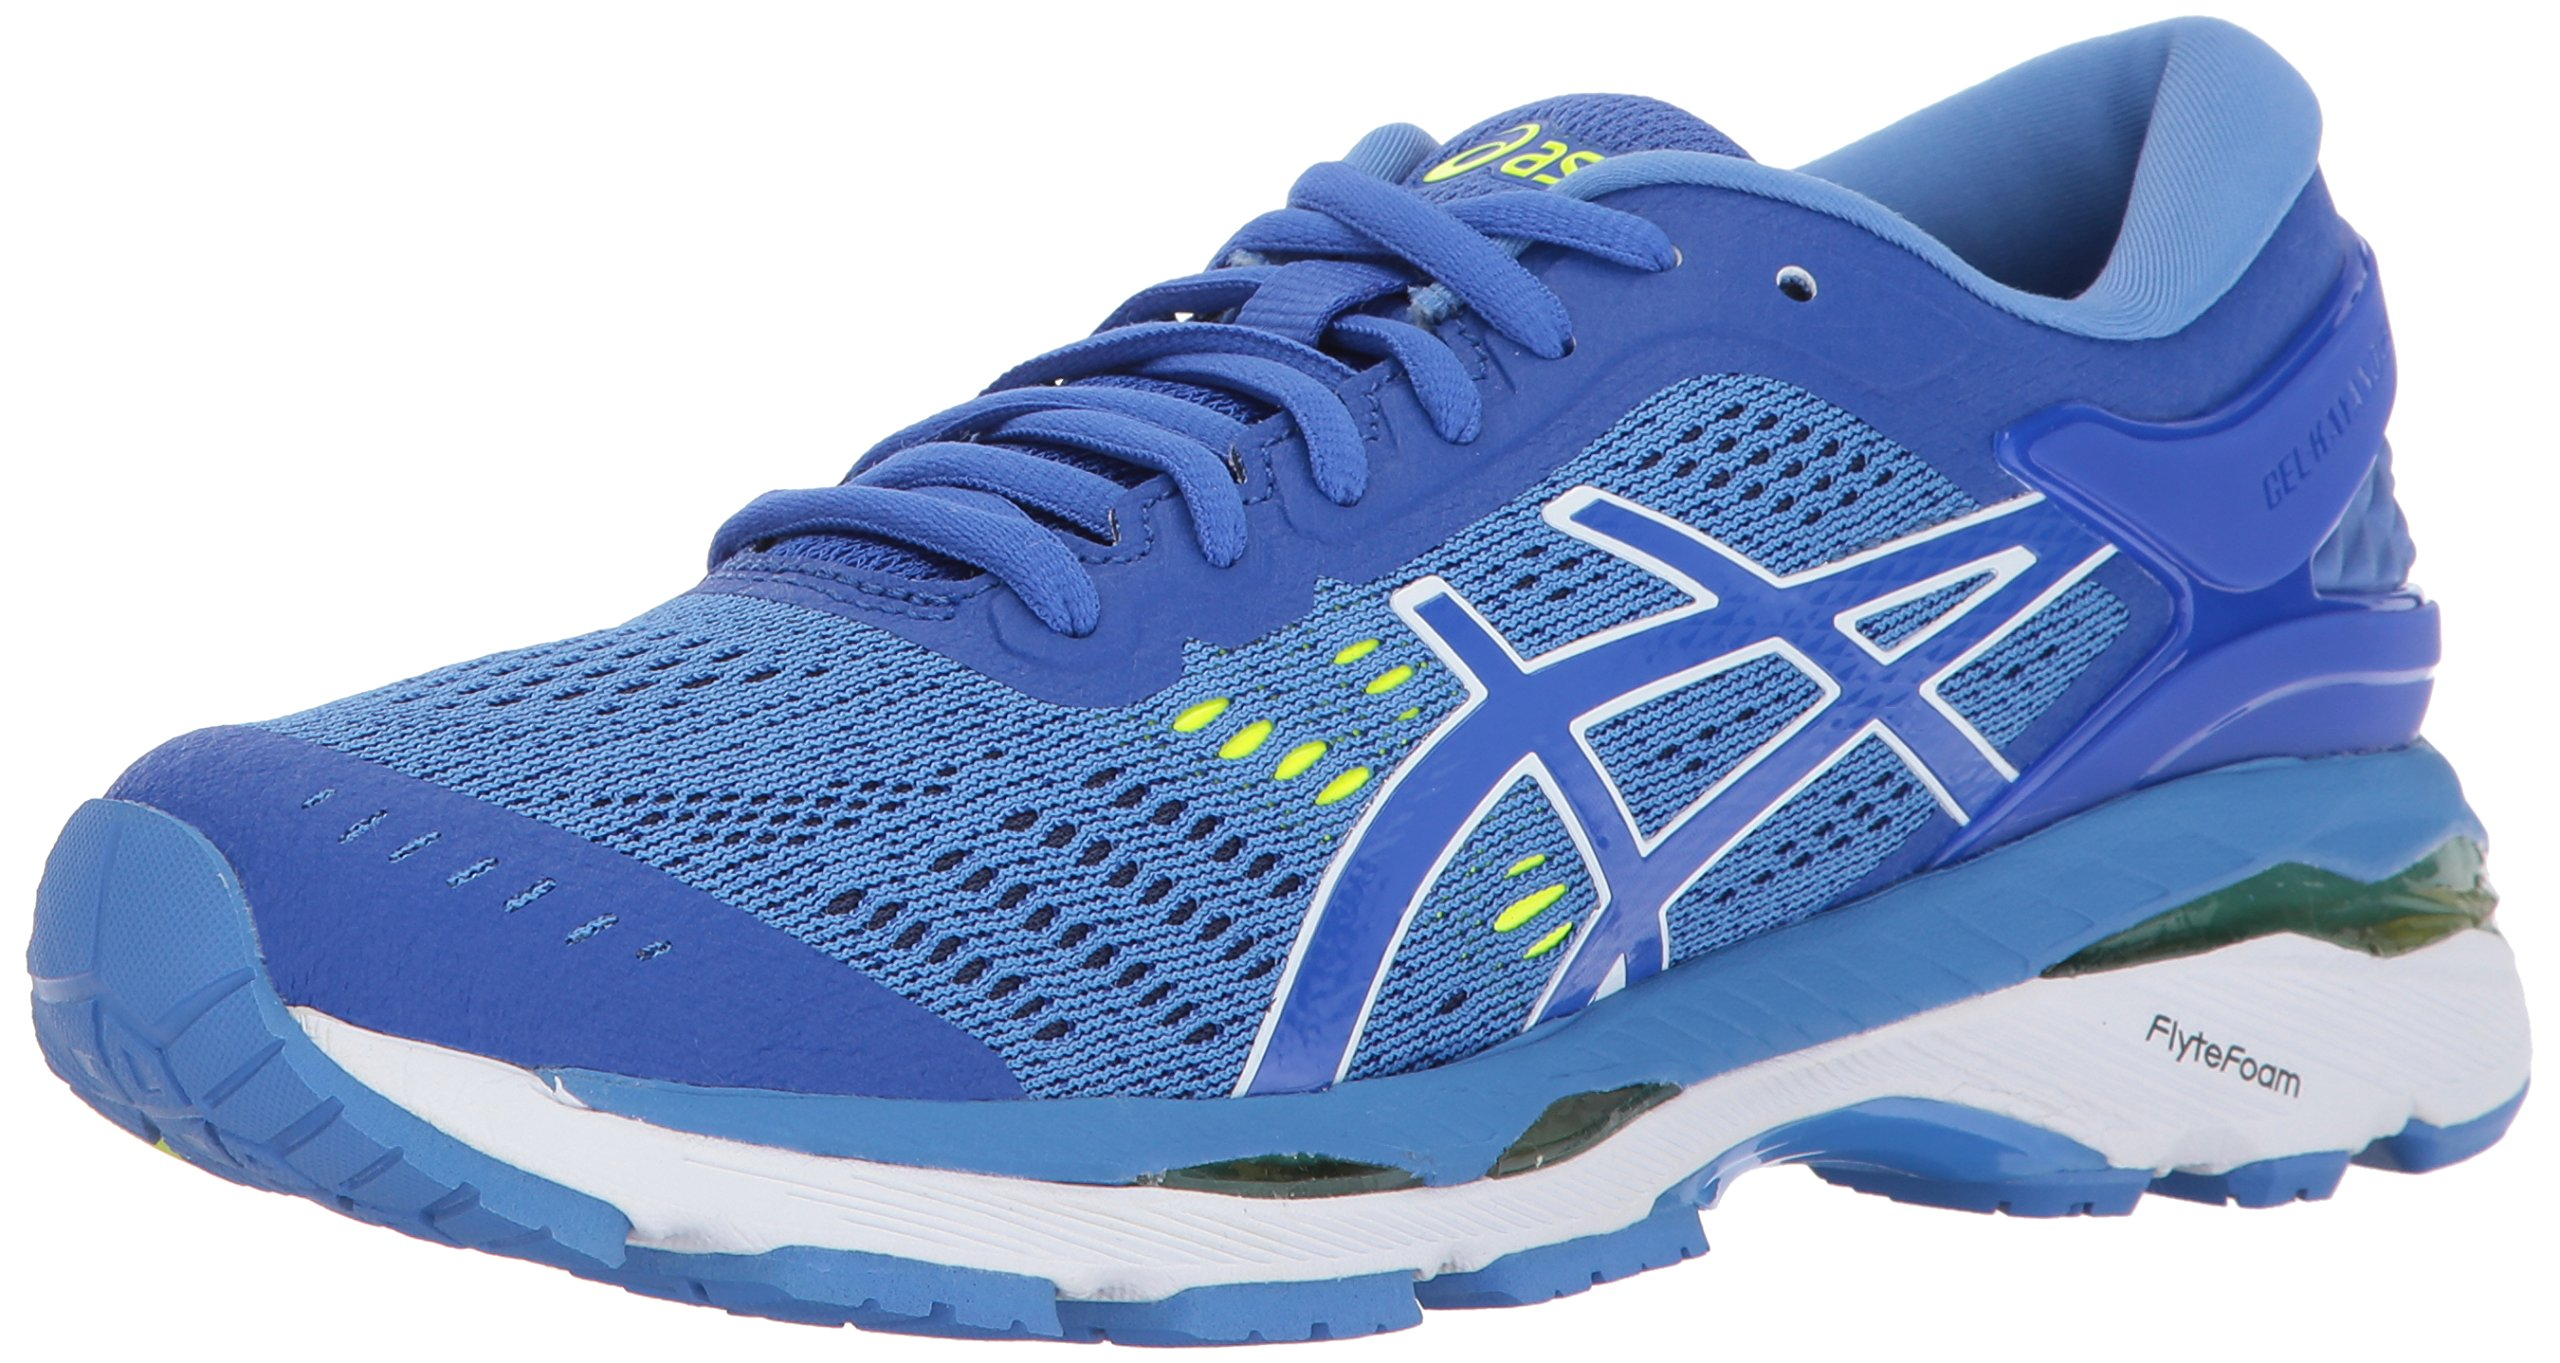 ASICS Women's Gel-Kayano 24 Running Shoe, Blue Purple/Regatta Blue/White, 10 D US